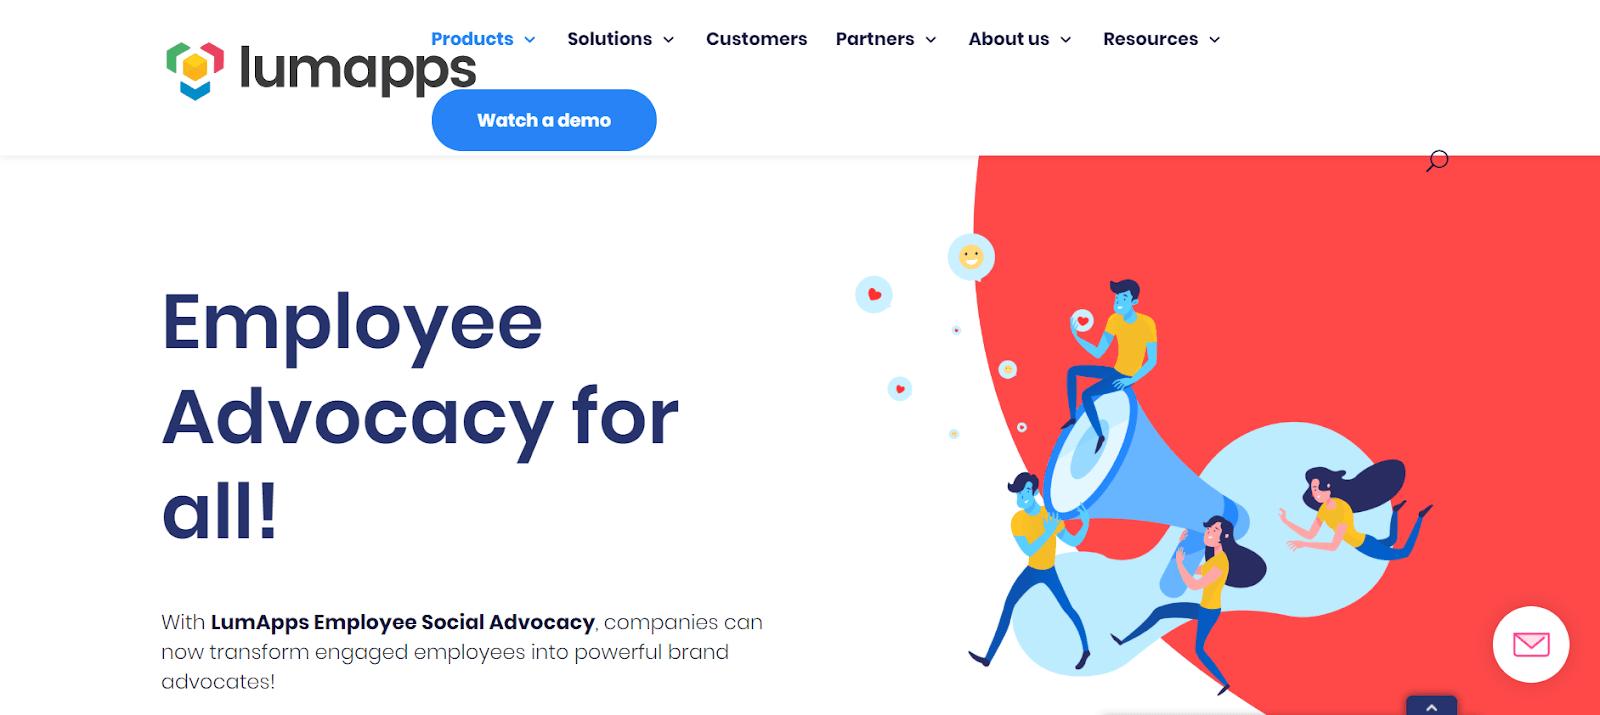 LumApps Employee Advocacy Tools